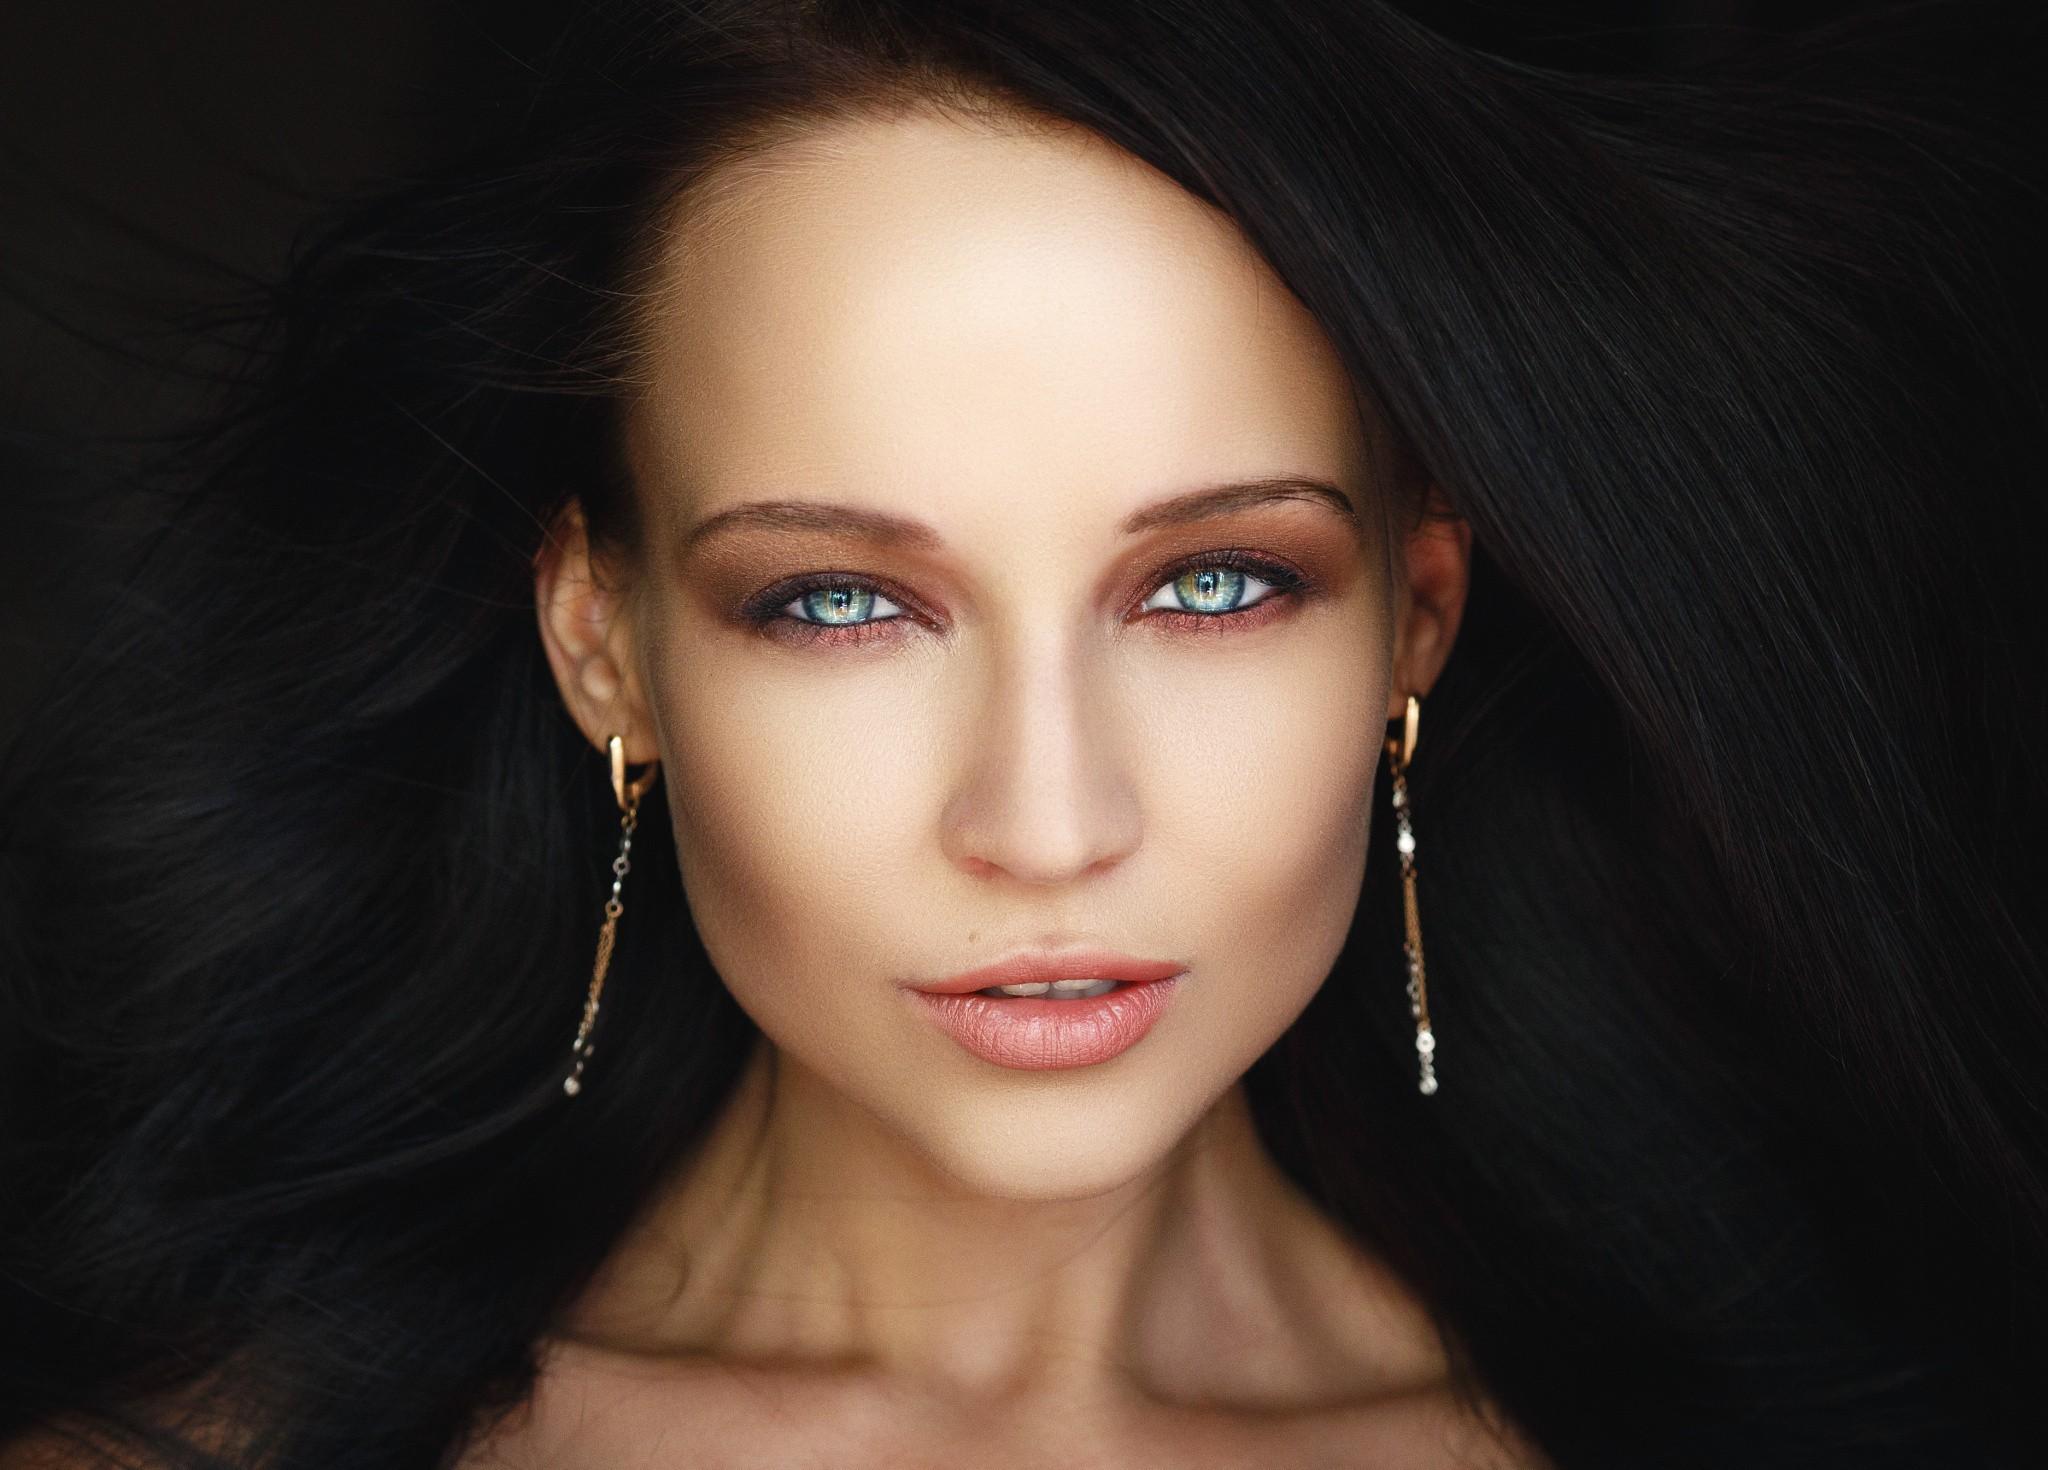 Angelina Petrova High Quality Wallpapers